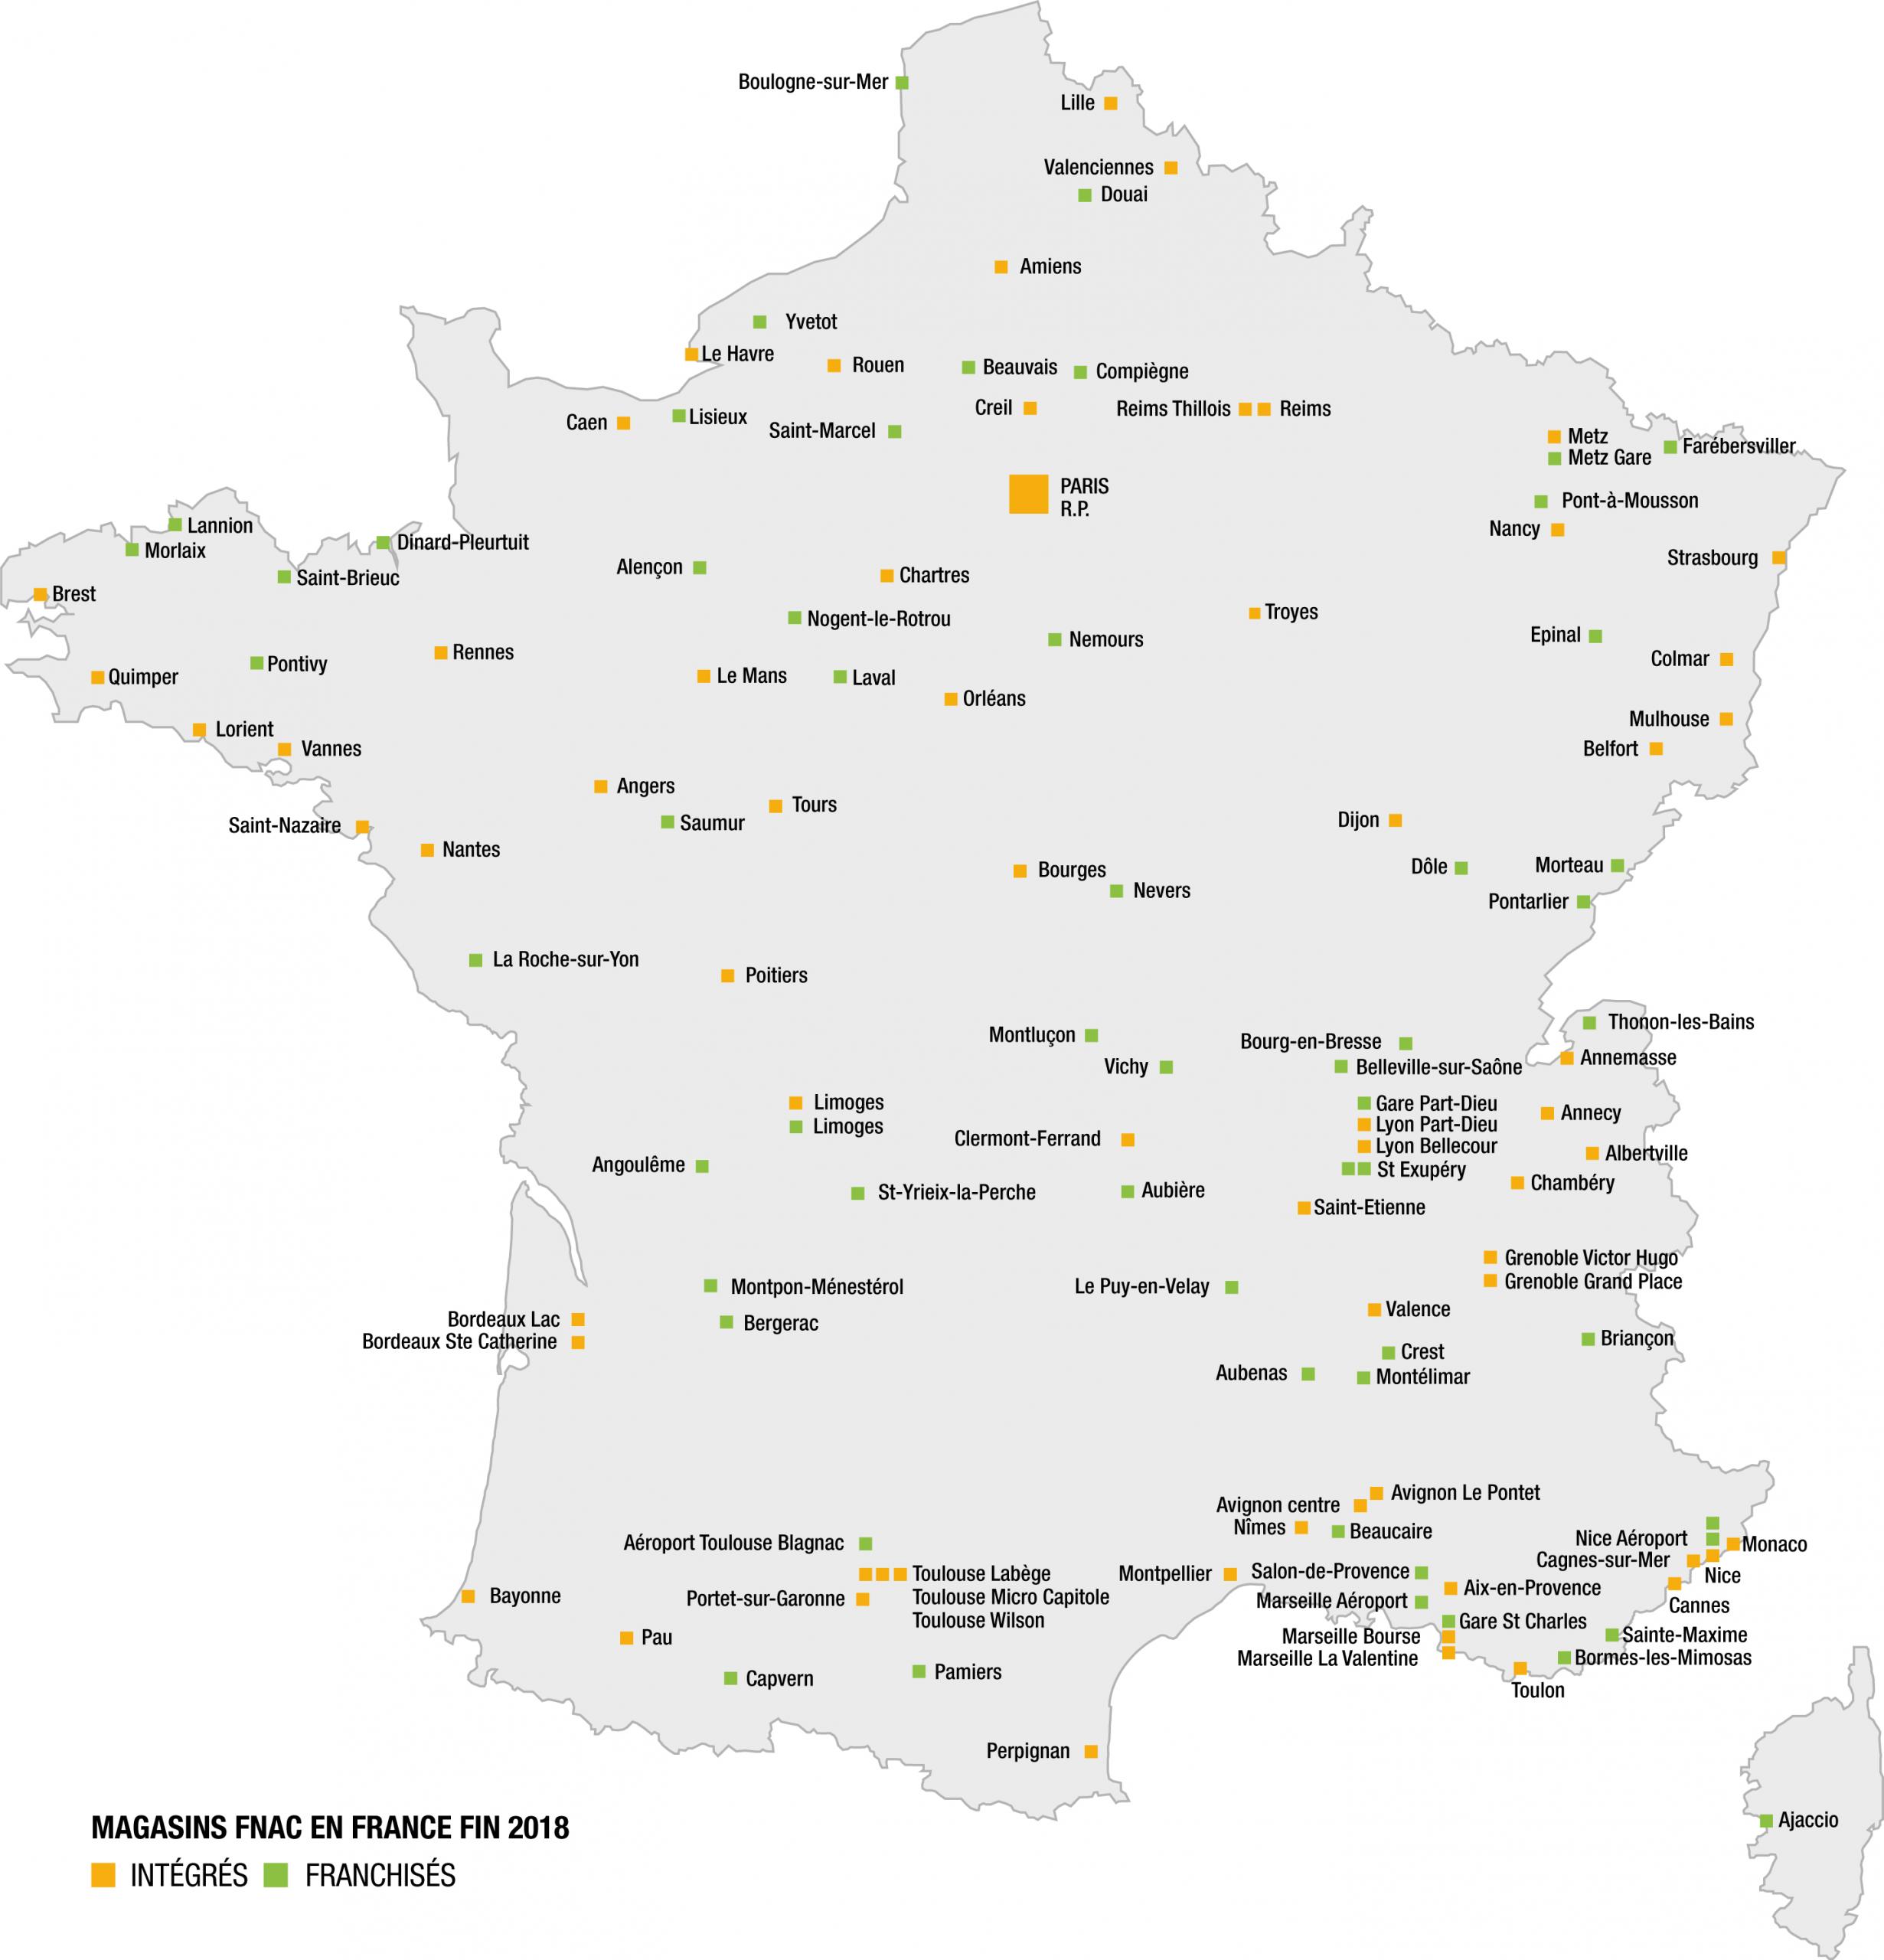 Fnac Darty Dans Le Monde - Fnac Darty destiné Carte De France Dom Tom